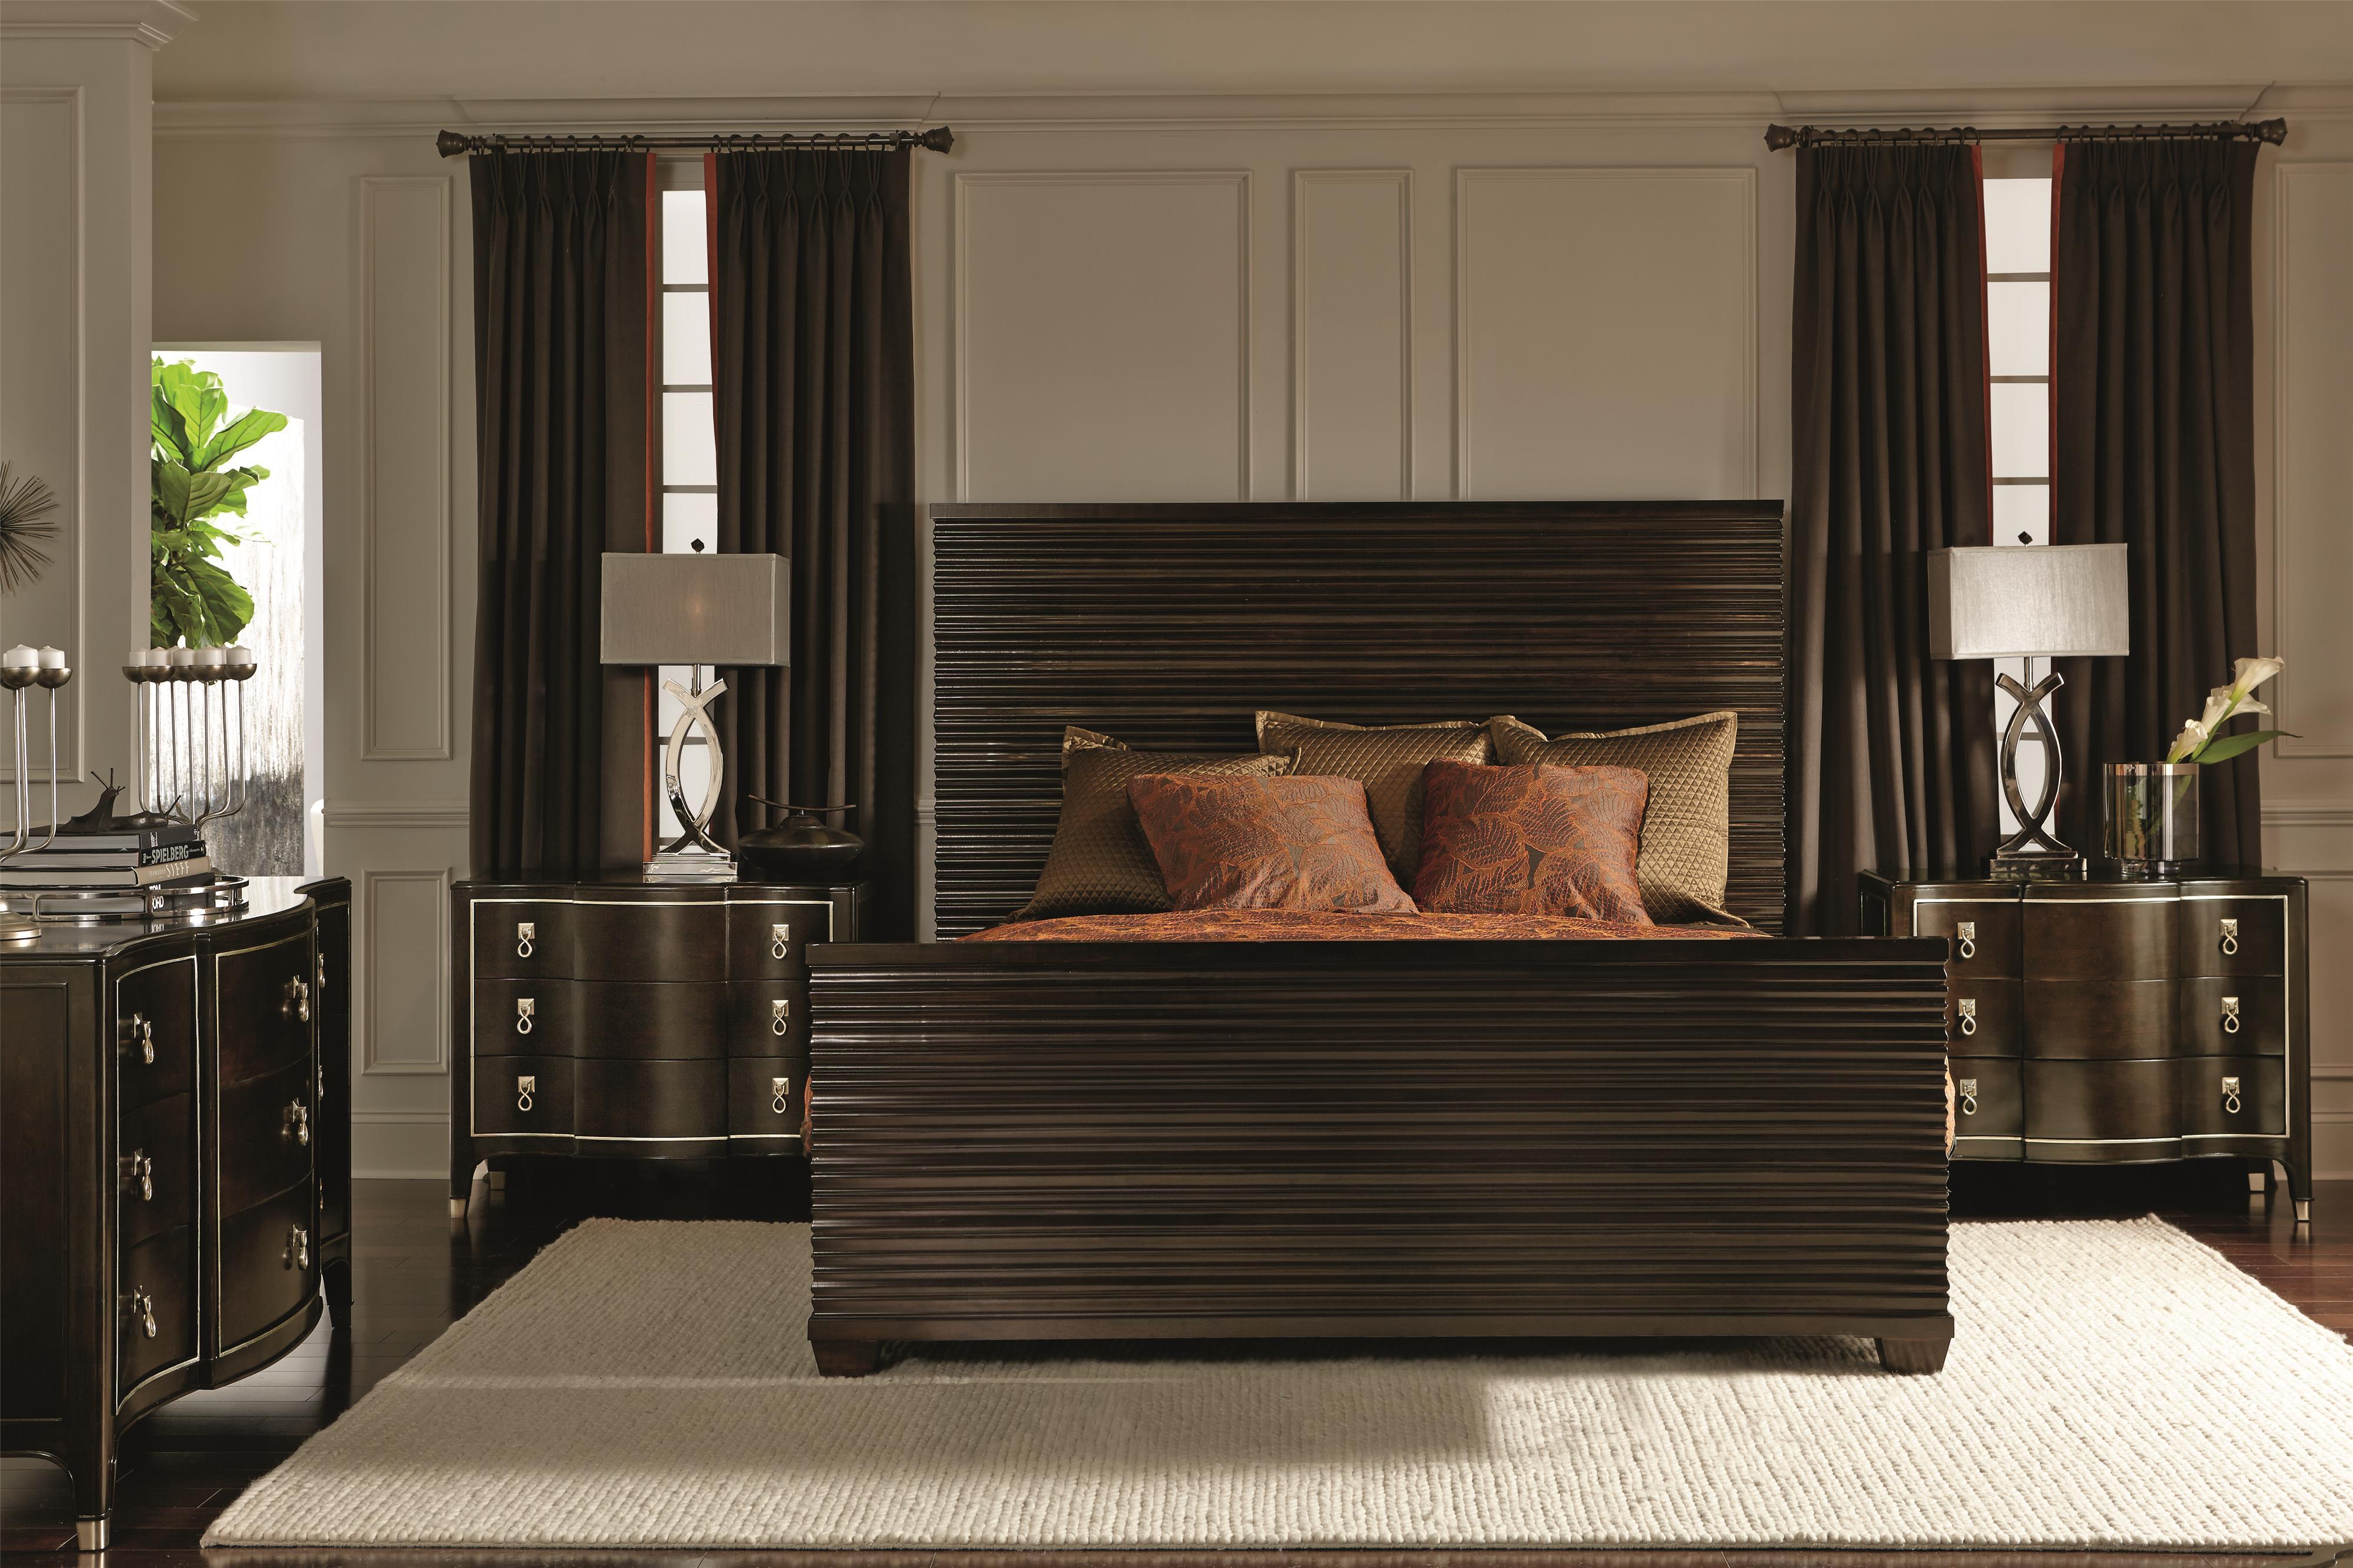 Bernhardt Miramont Queen Bedroom Group 7   Sprintz Furniture   Bedroom  Group Nashville, Franklin, And Greater Tennessee